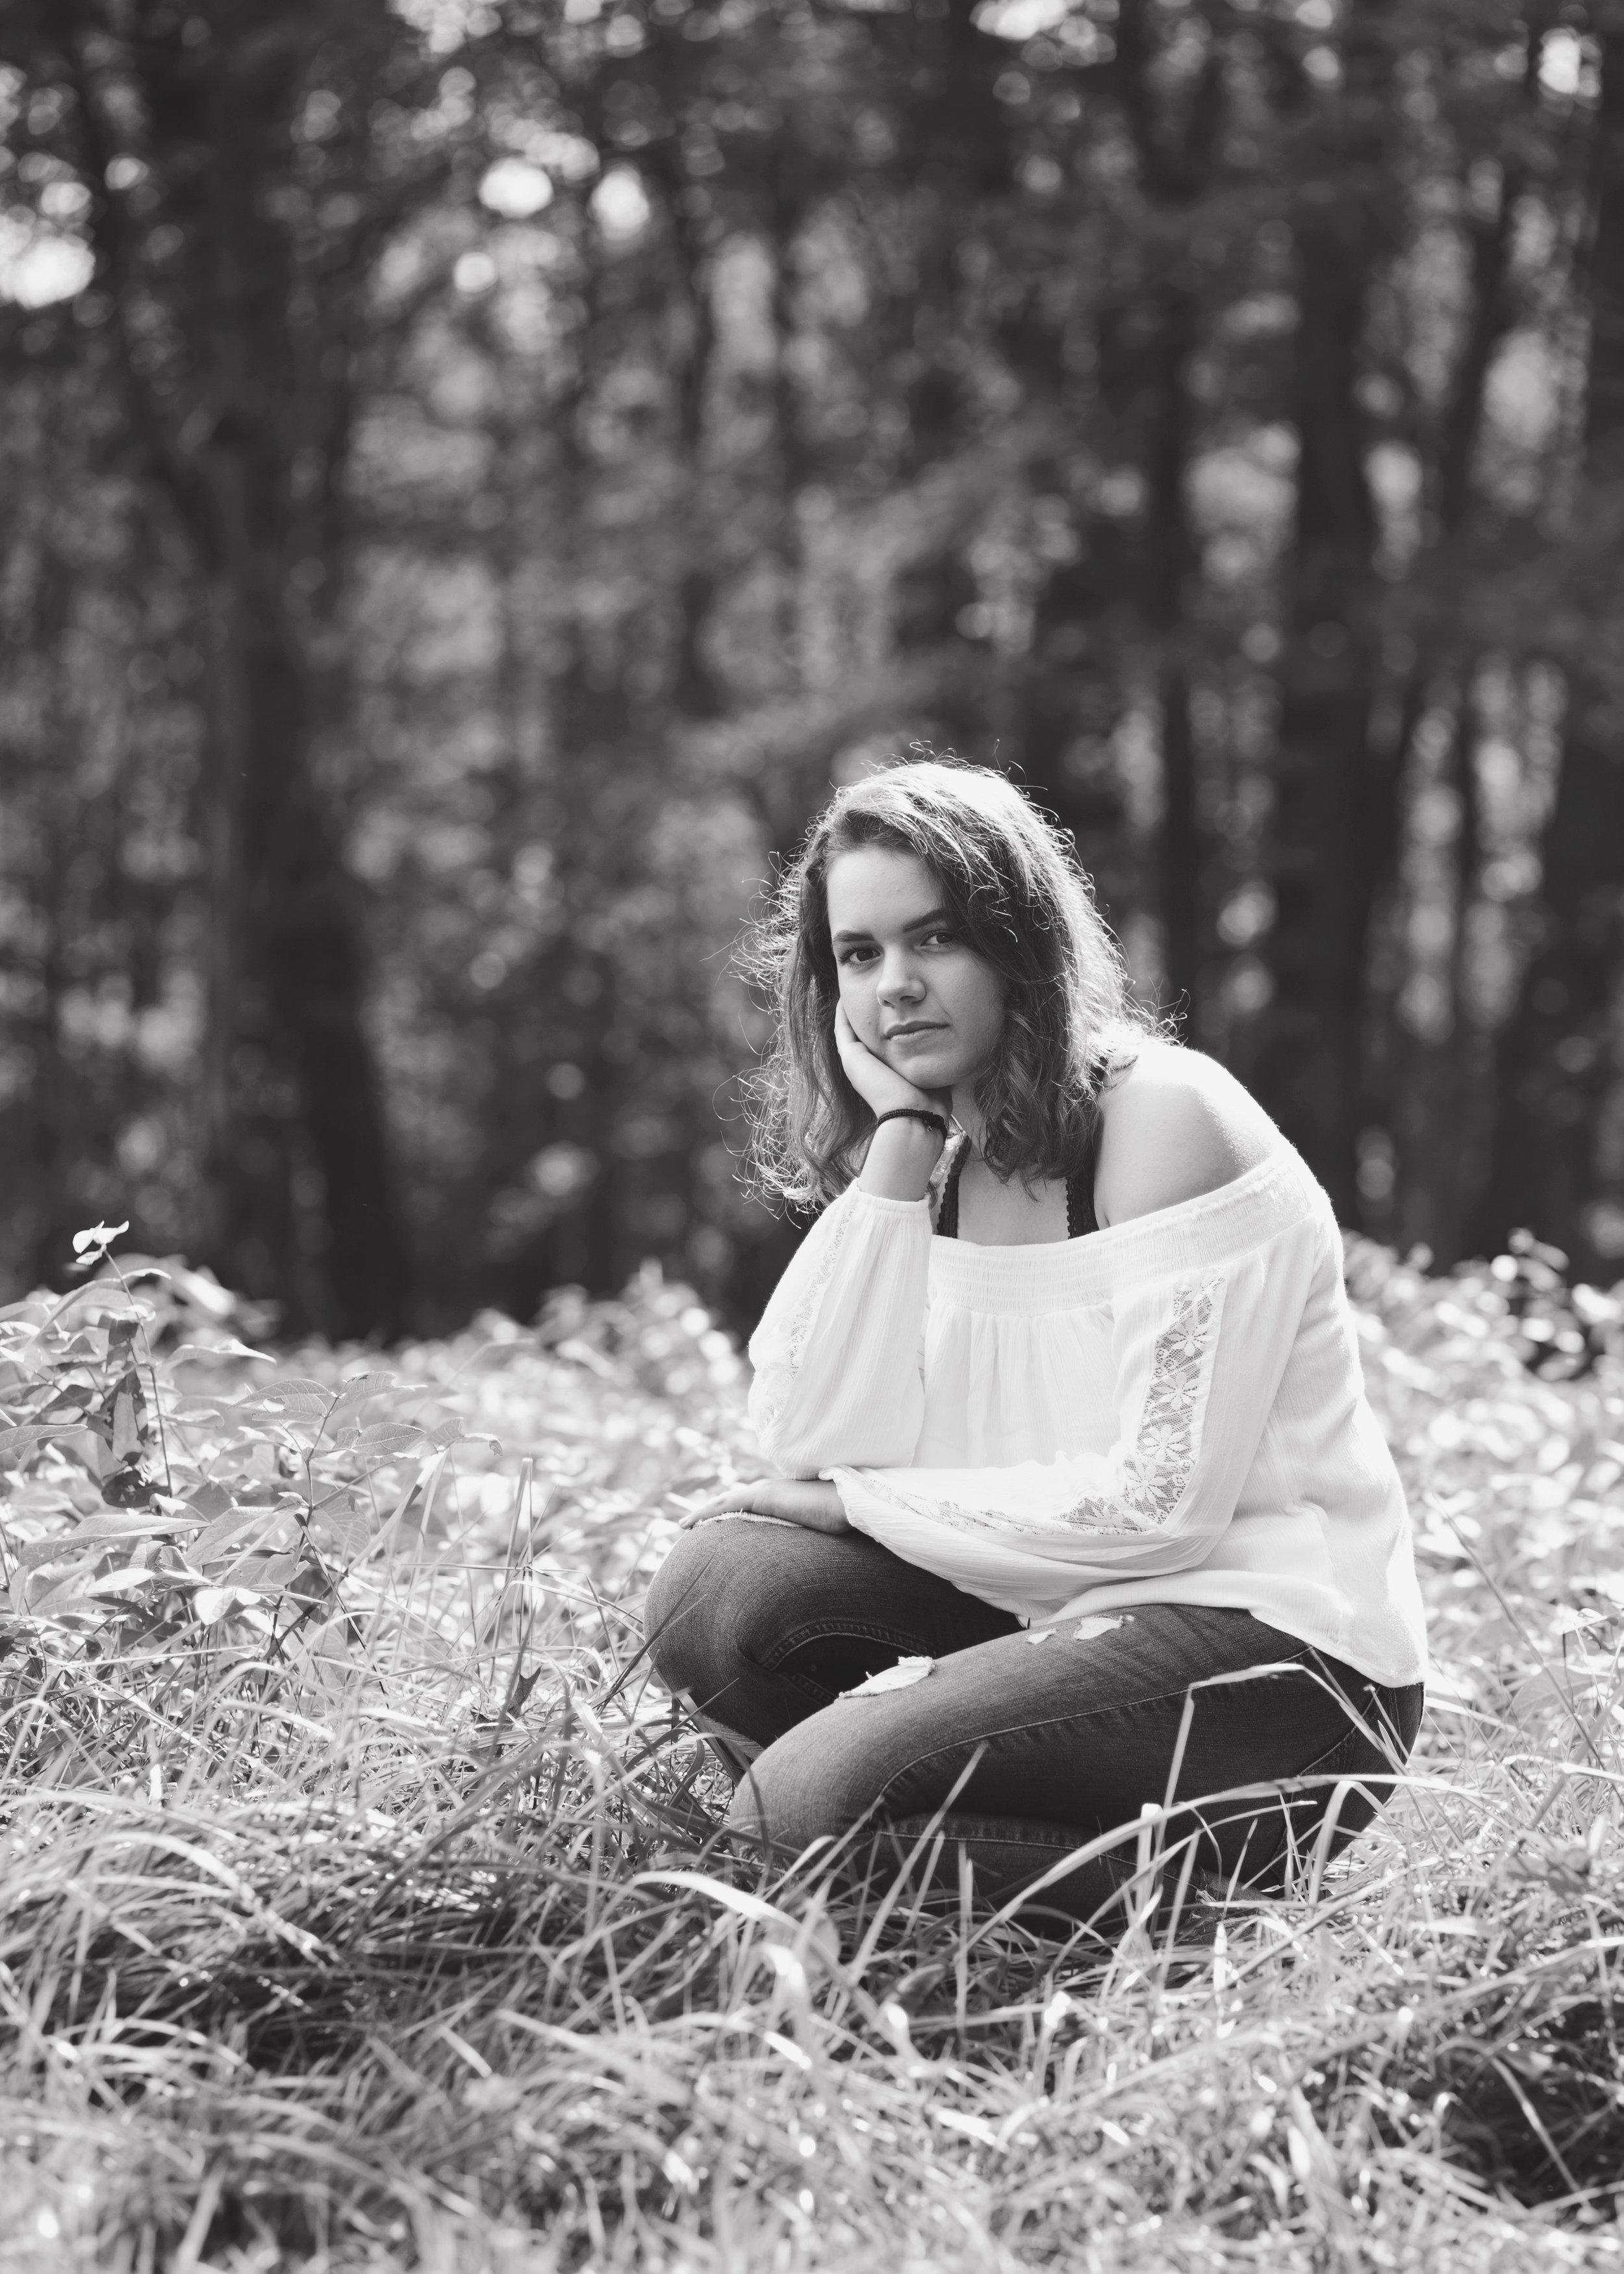 Senior Photographer | Kelly Rhoades Photography